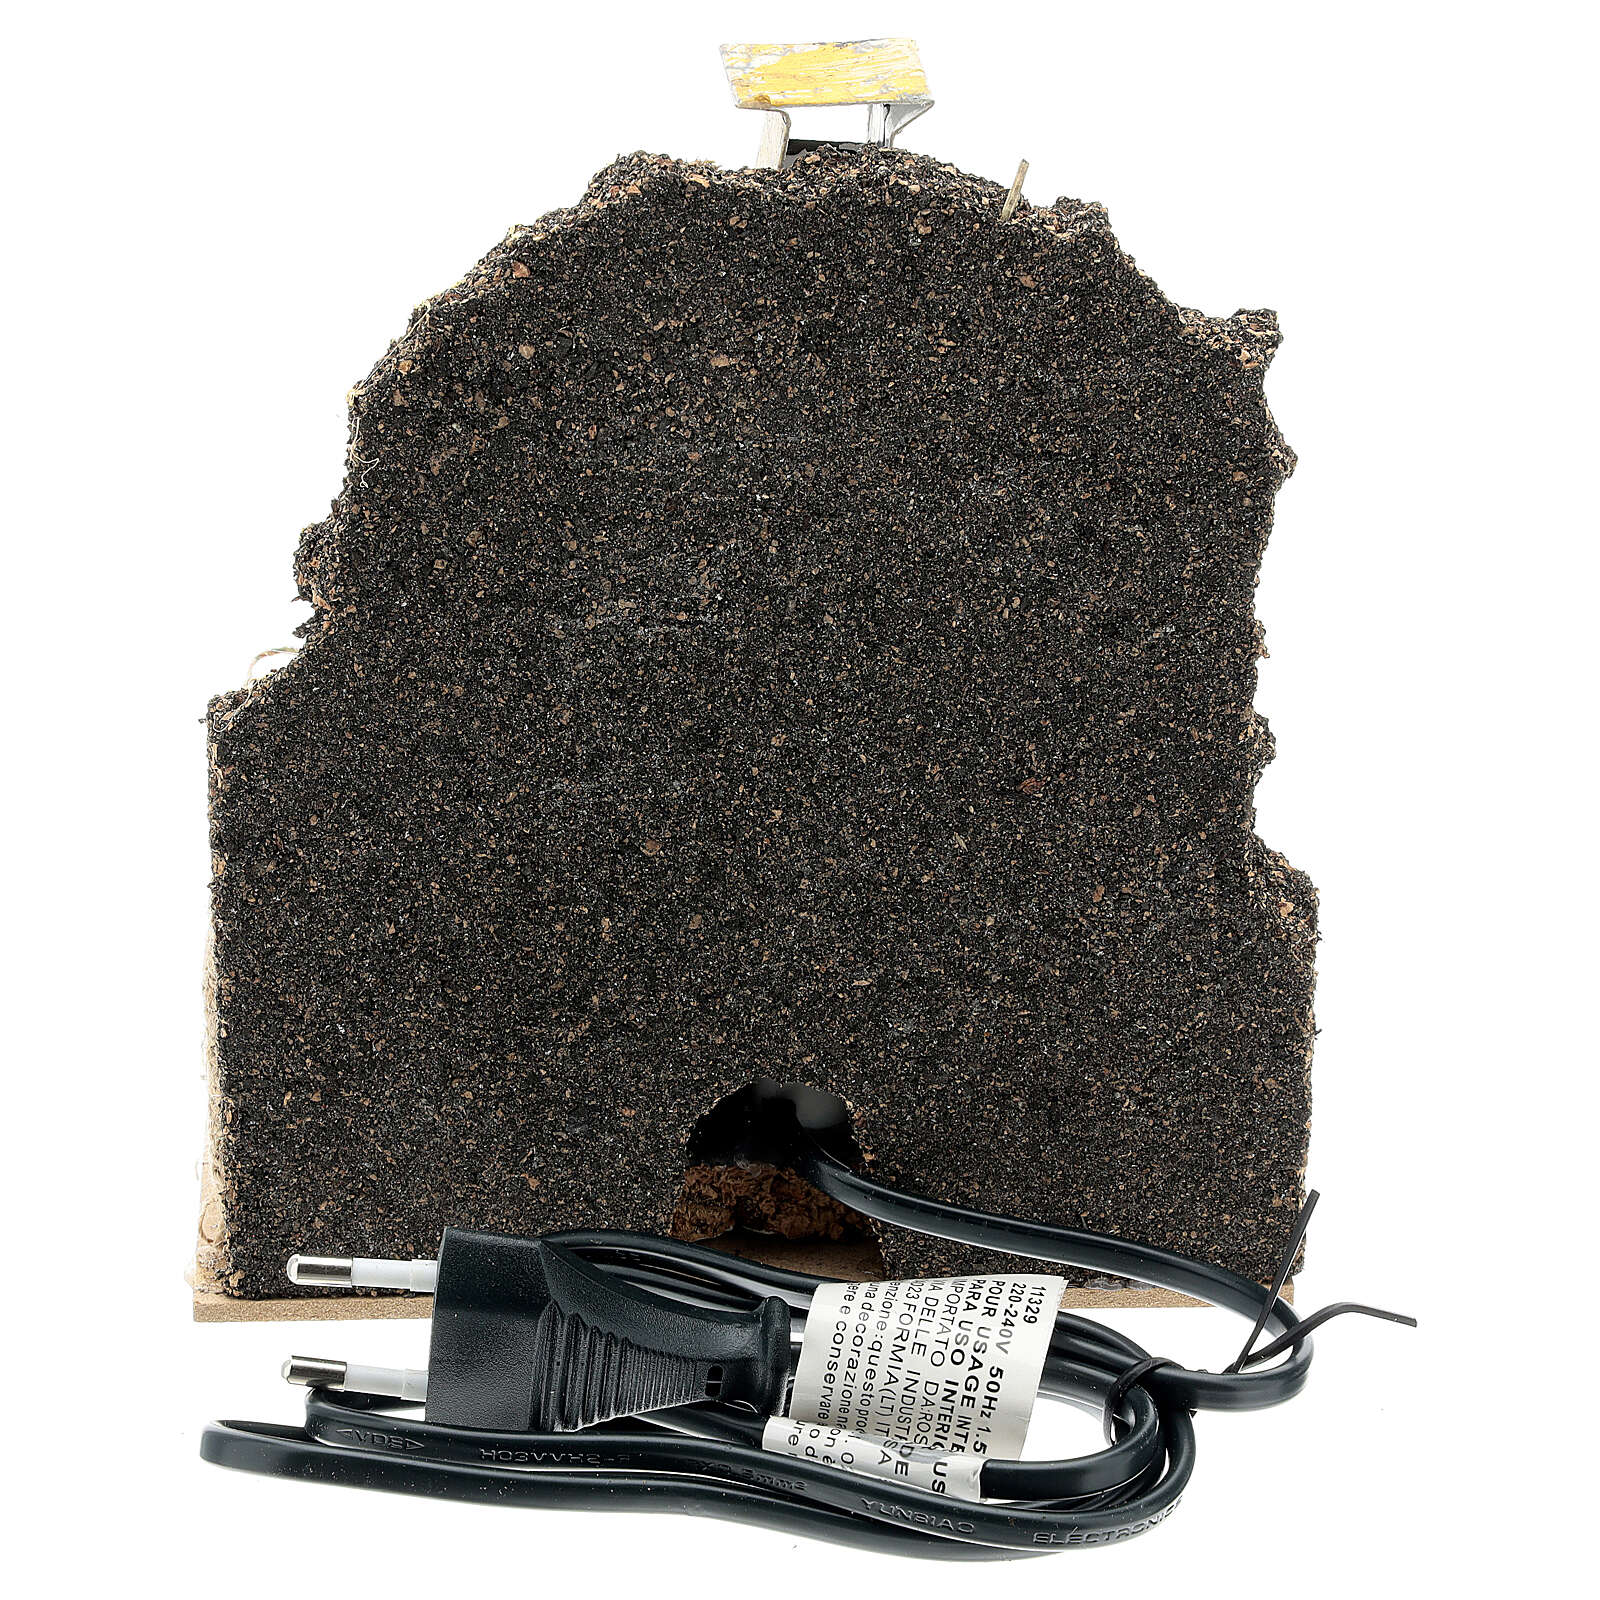 Horno leña albañilería bombilla ef llama 15x15x10 belén 12-14 cm 4